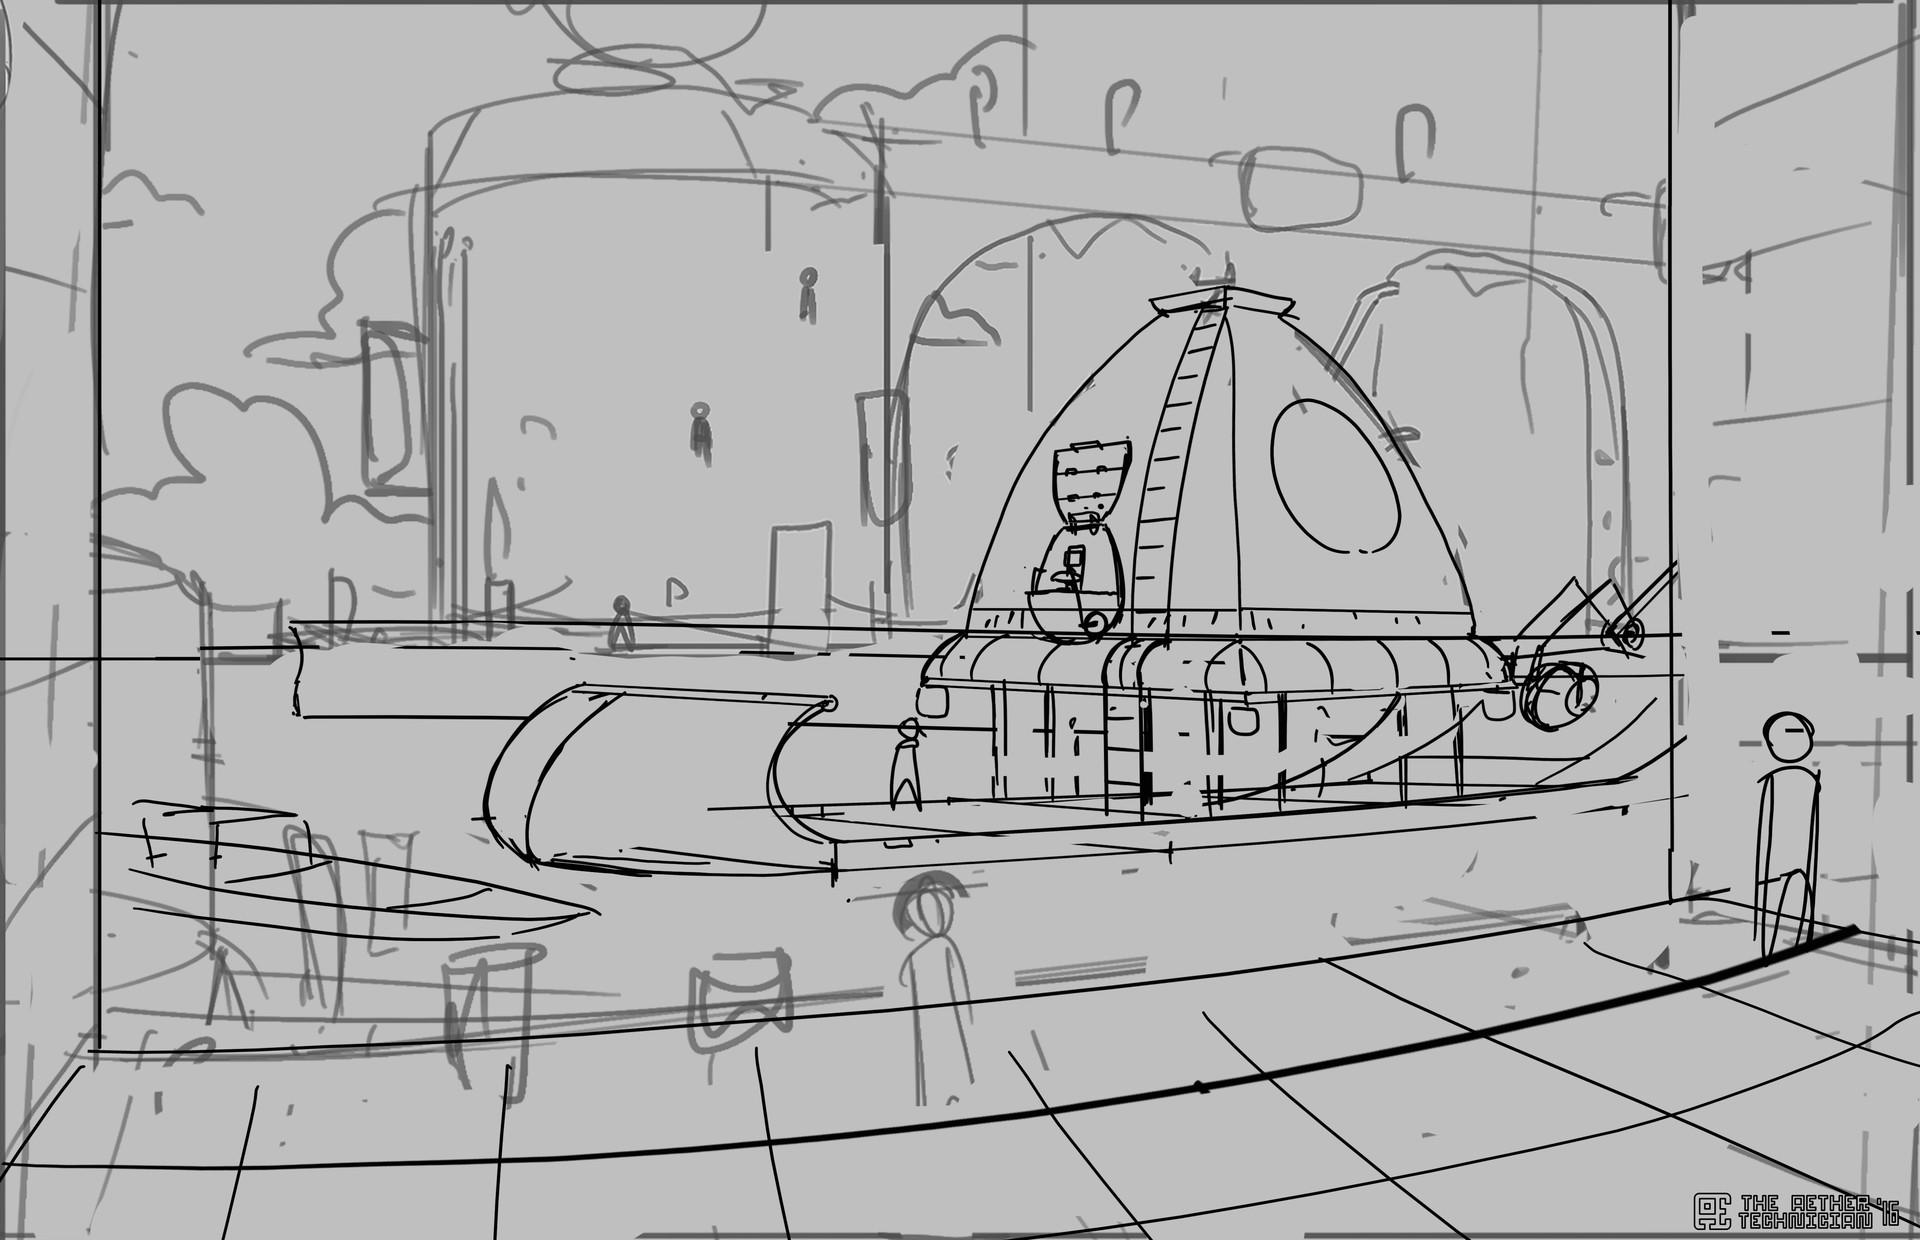 Samuel herb spiceboat mid sketch